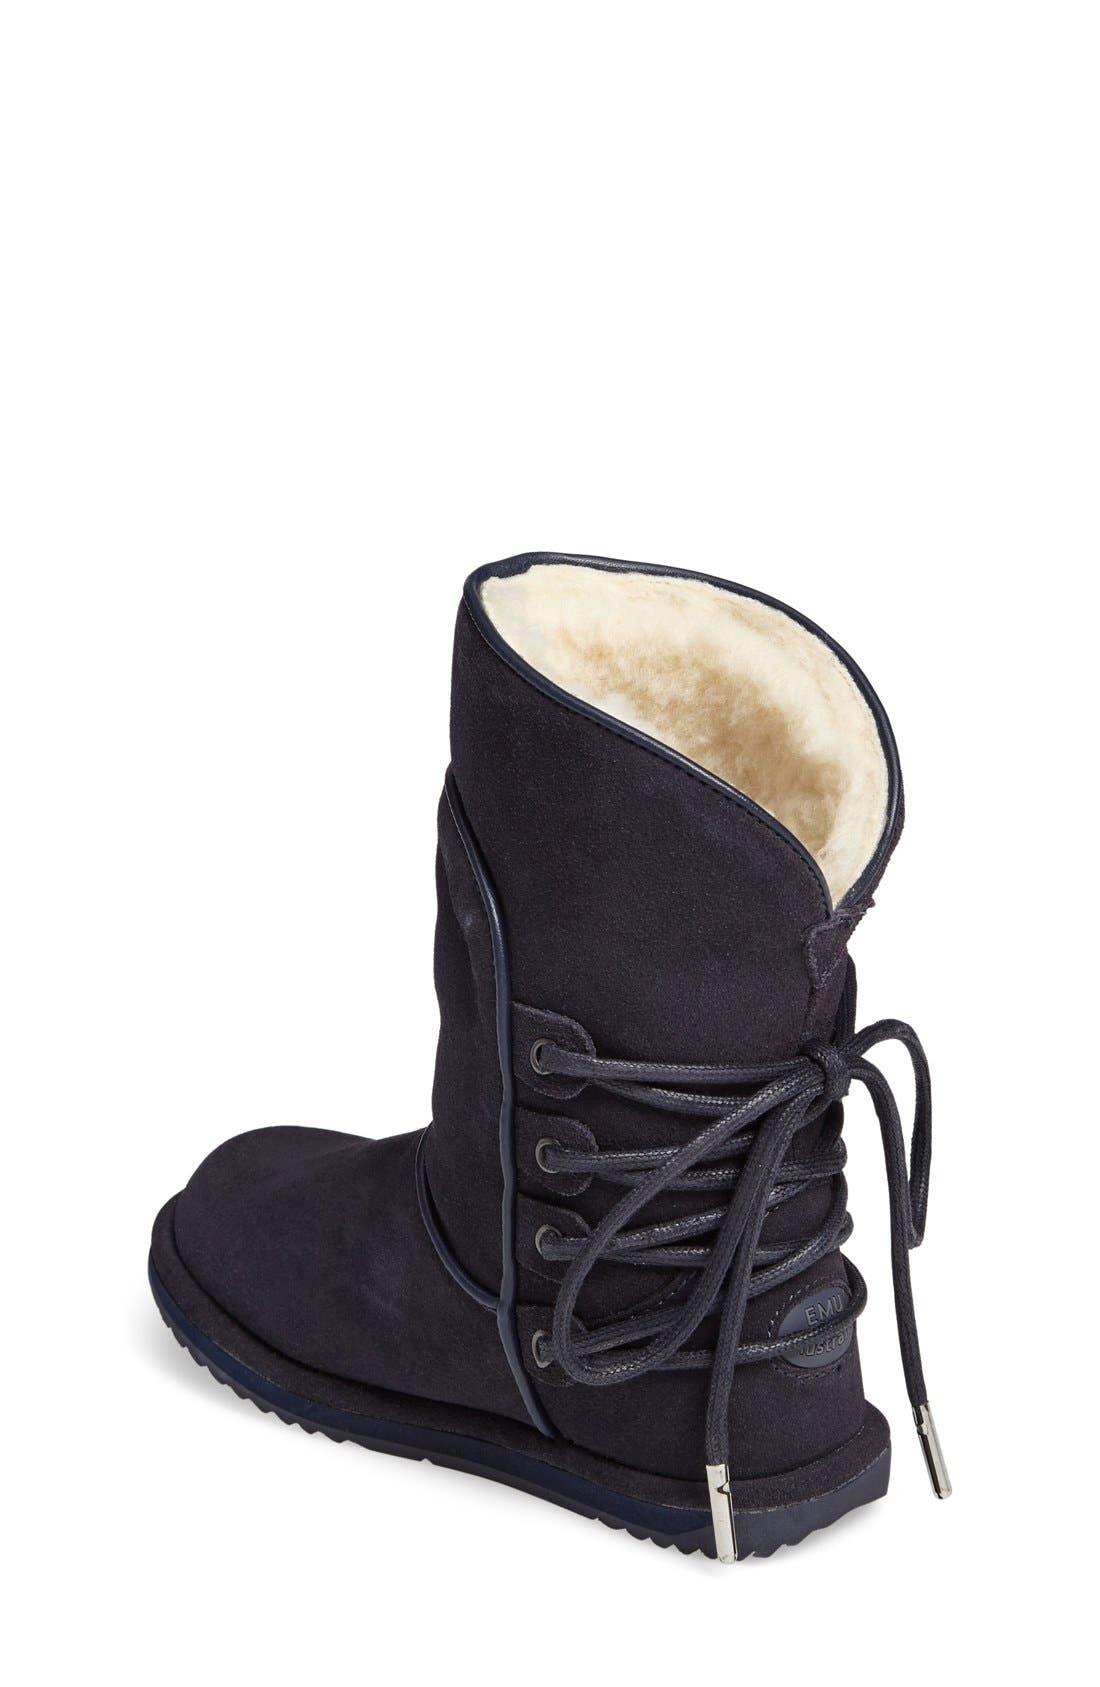 Islay Waterproof Boot,                             Alternate thumbnail 7, color,